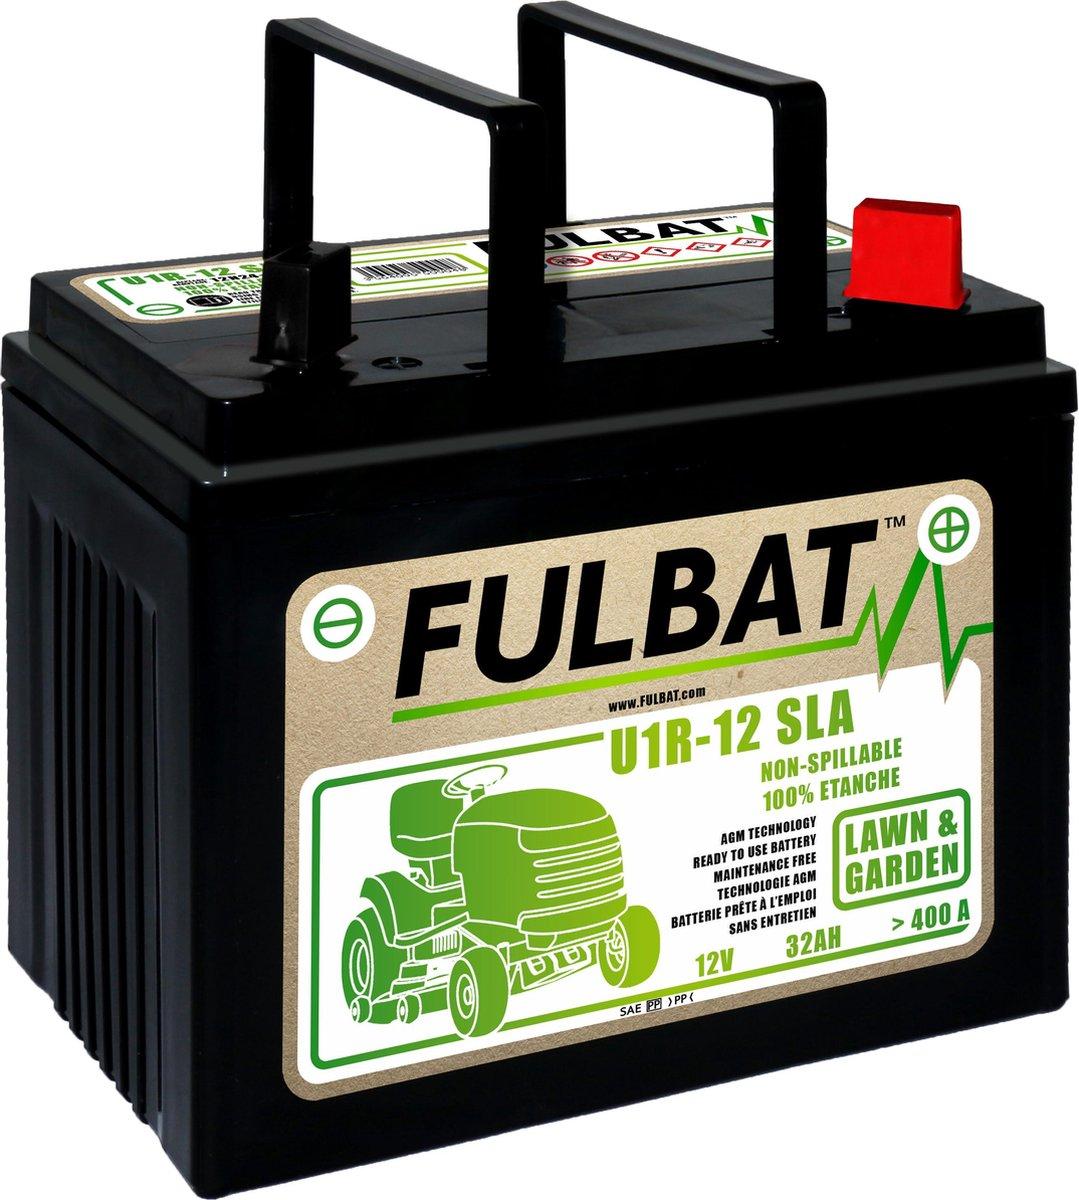 Fulbat/BoParts accu voor oa. zitmaaiers U1R-12 / 32Ah